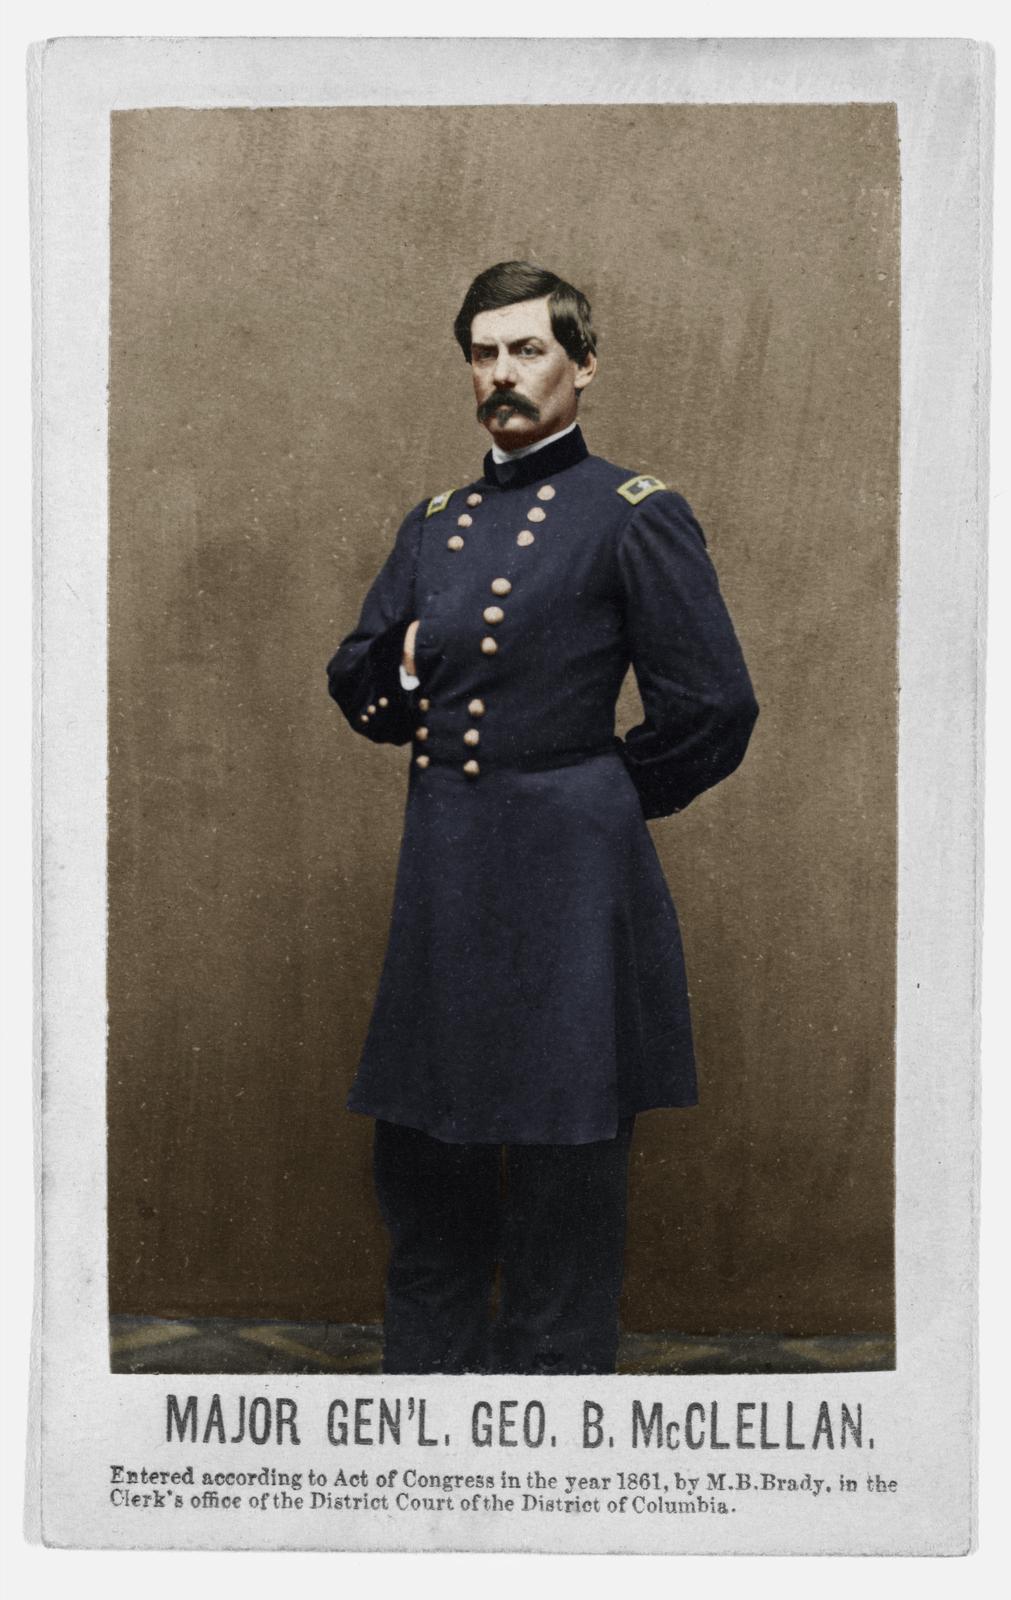 Major Gen'l Geo. B. McClellan.jpg